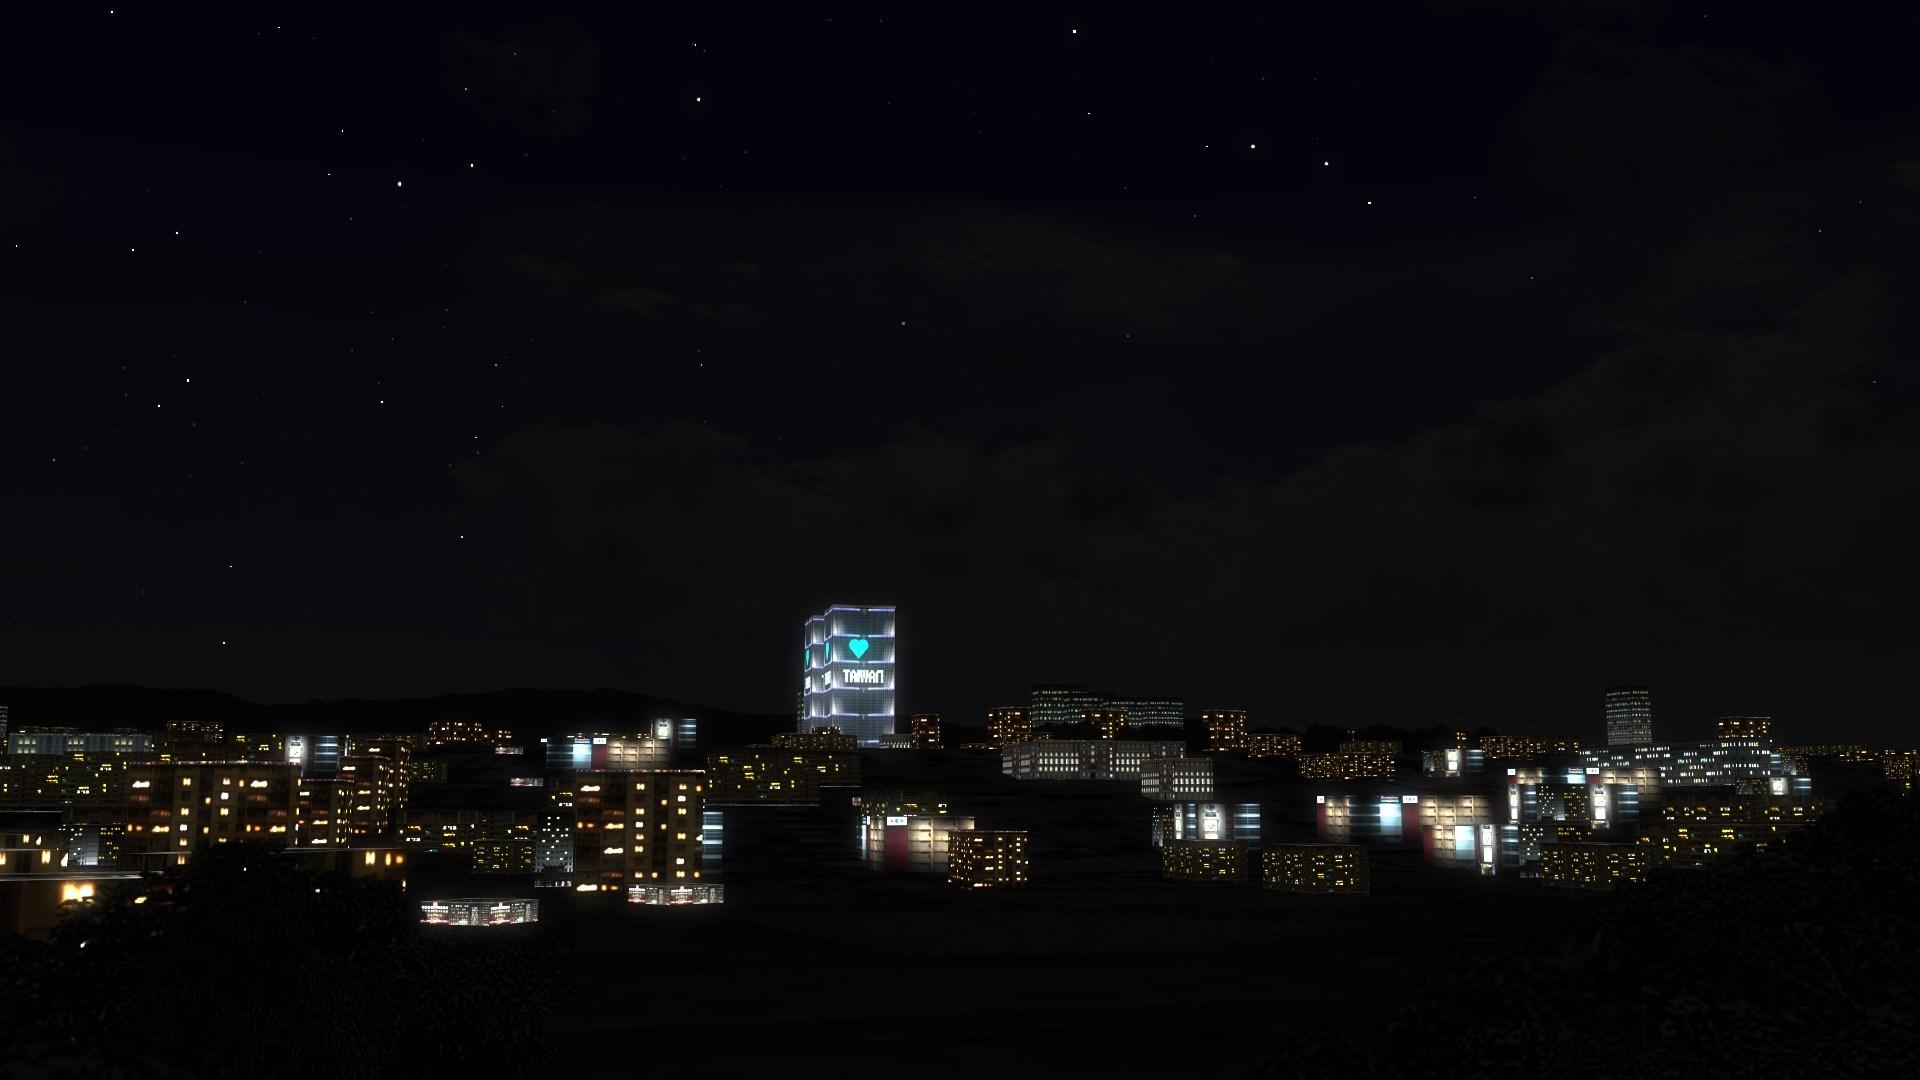 Night Building Texture Beta